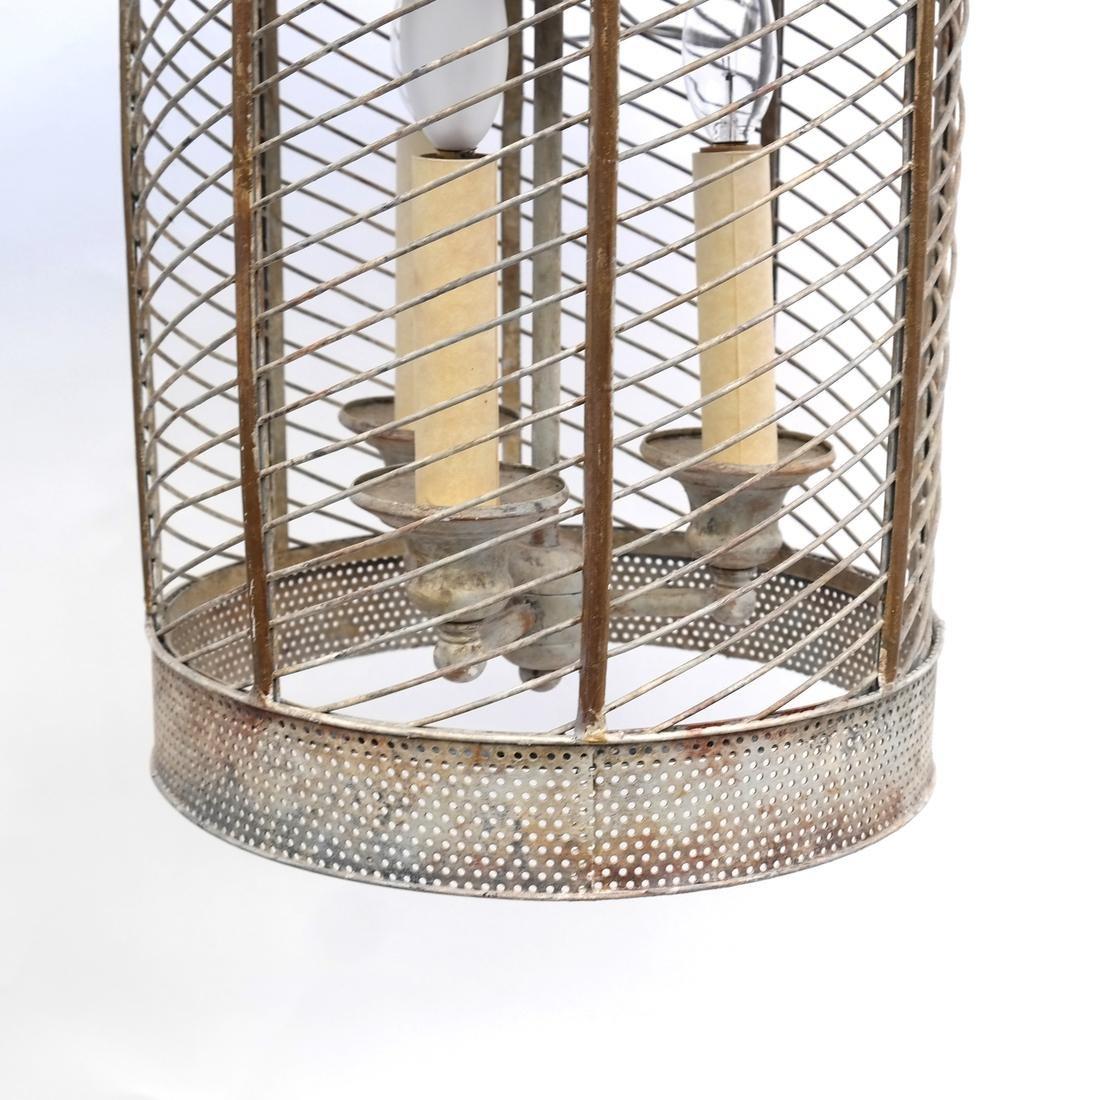 Pagoda-Form Lantern - 3